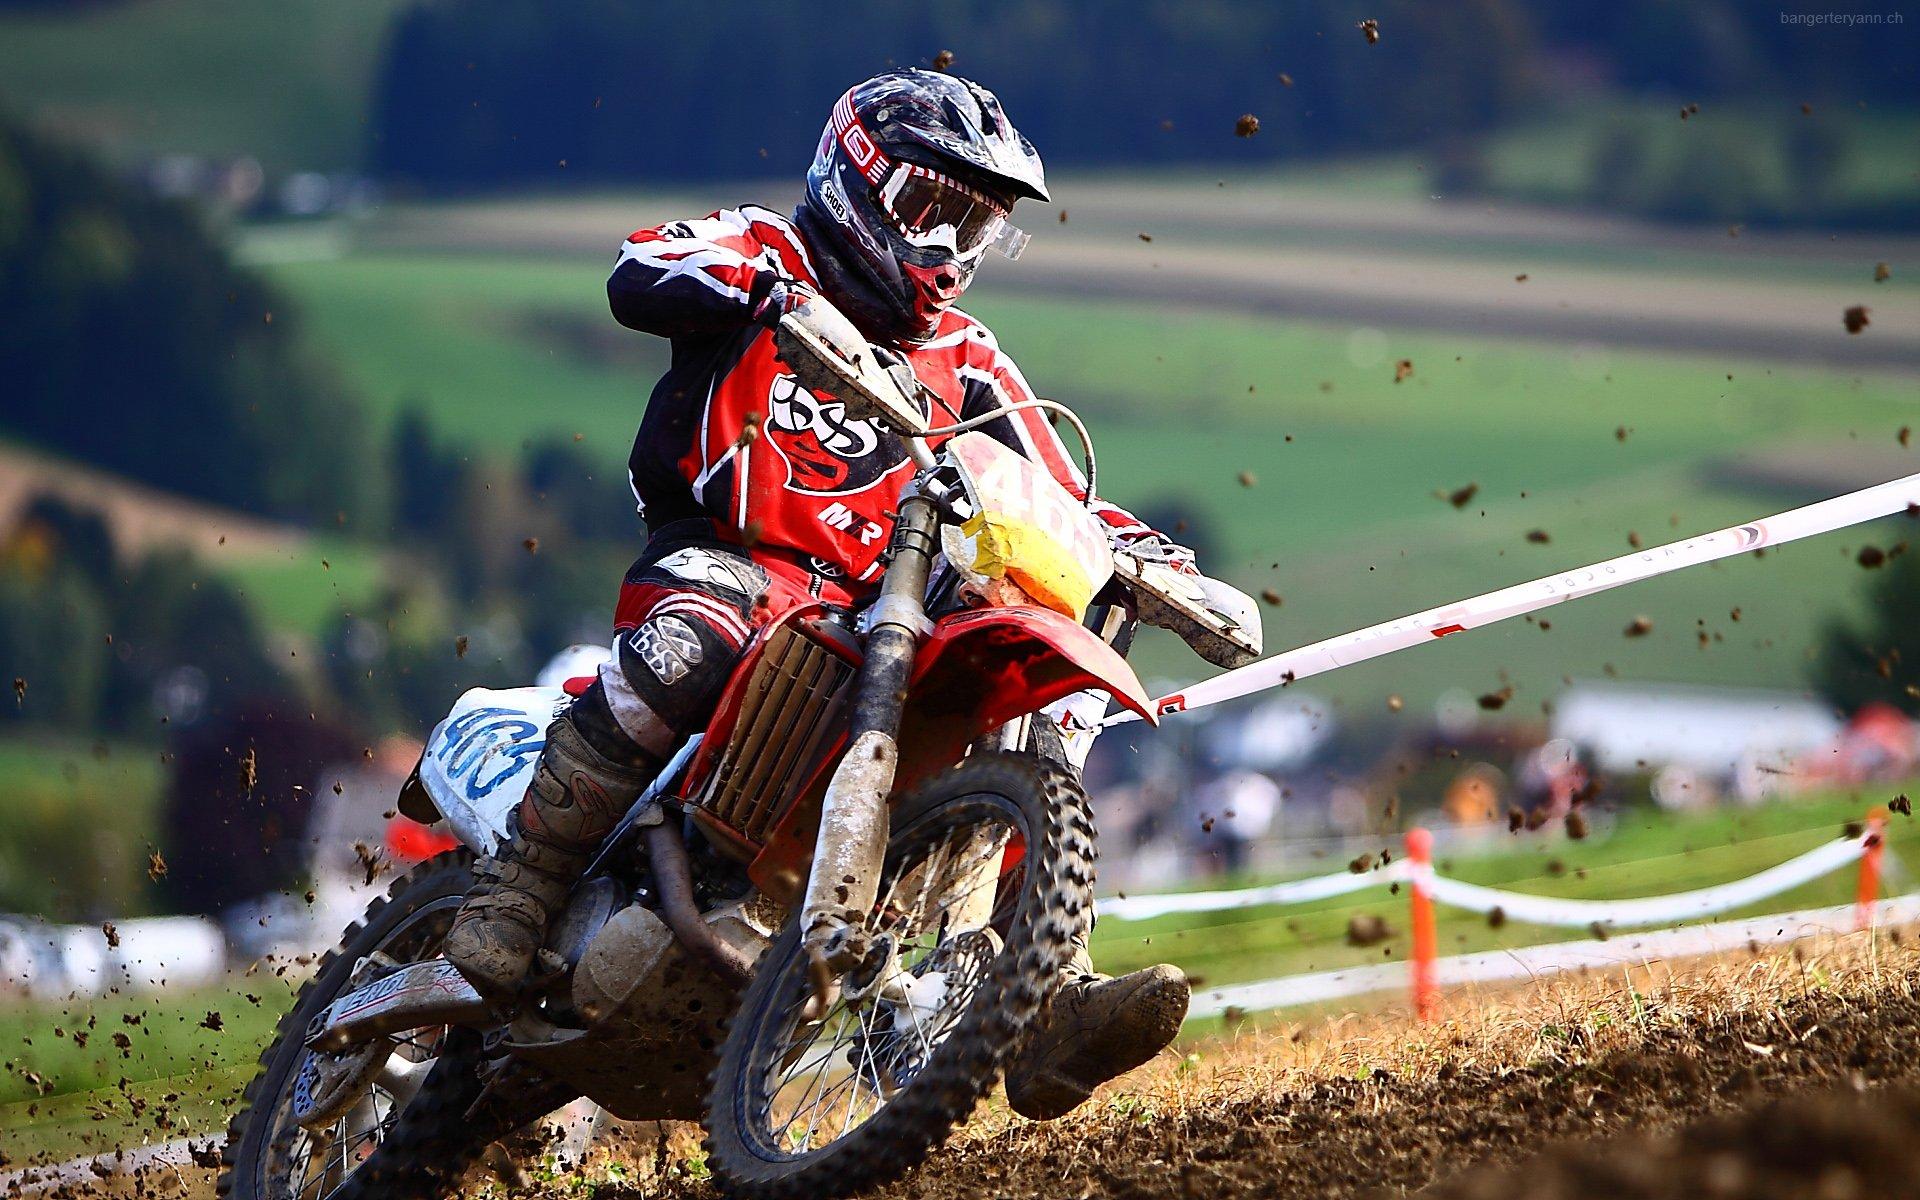 Fonds d'écran Motos Motocross The Red Driver